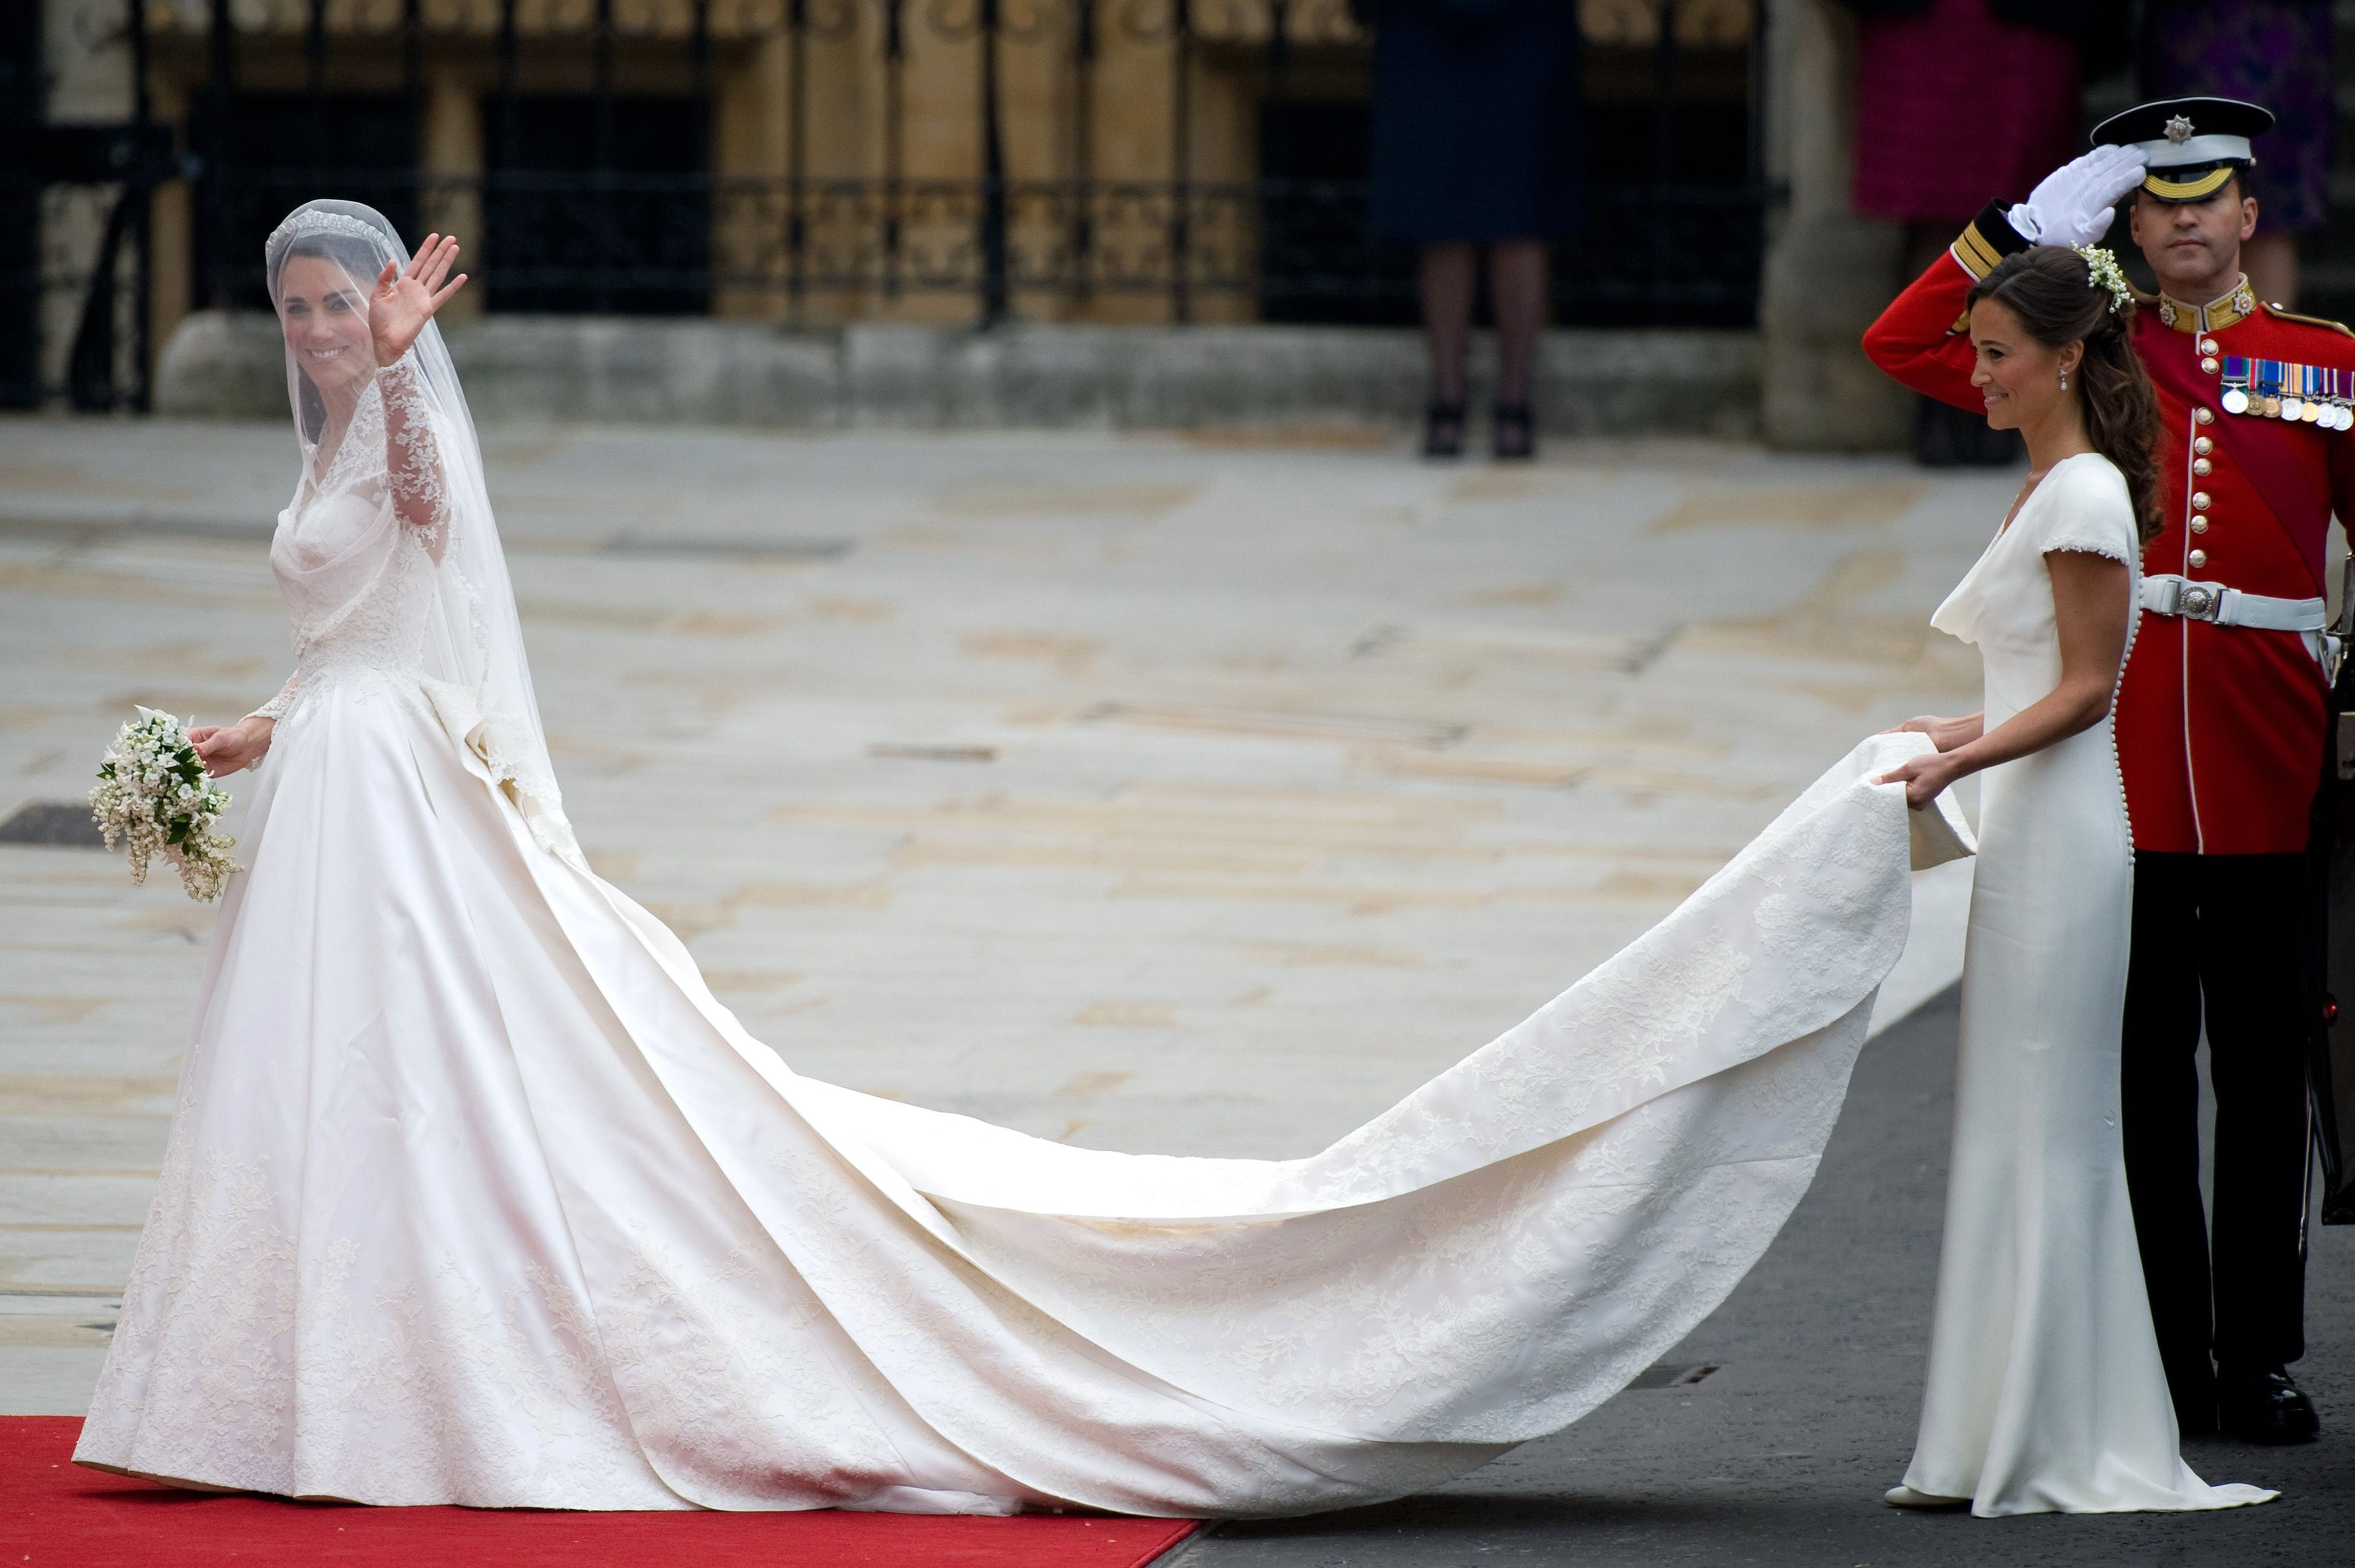 Kate Middleton and Prince William Wedding Photos - Royal Wedding ...